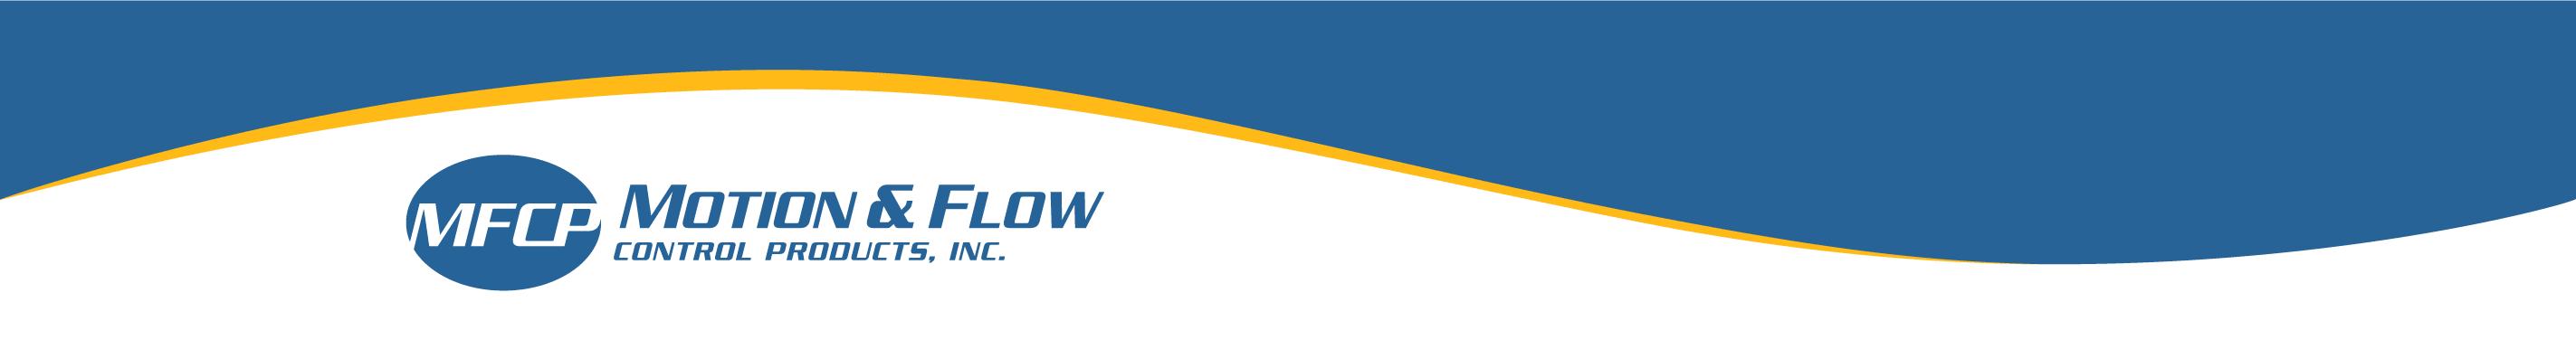 mfcp-logo